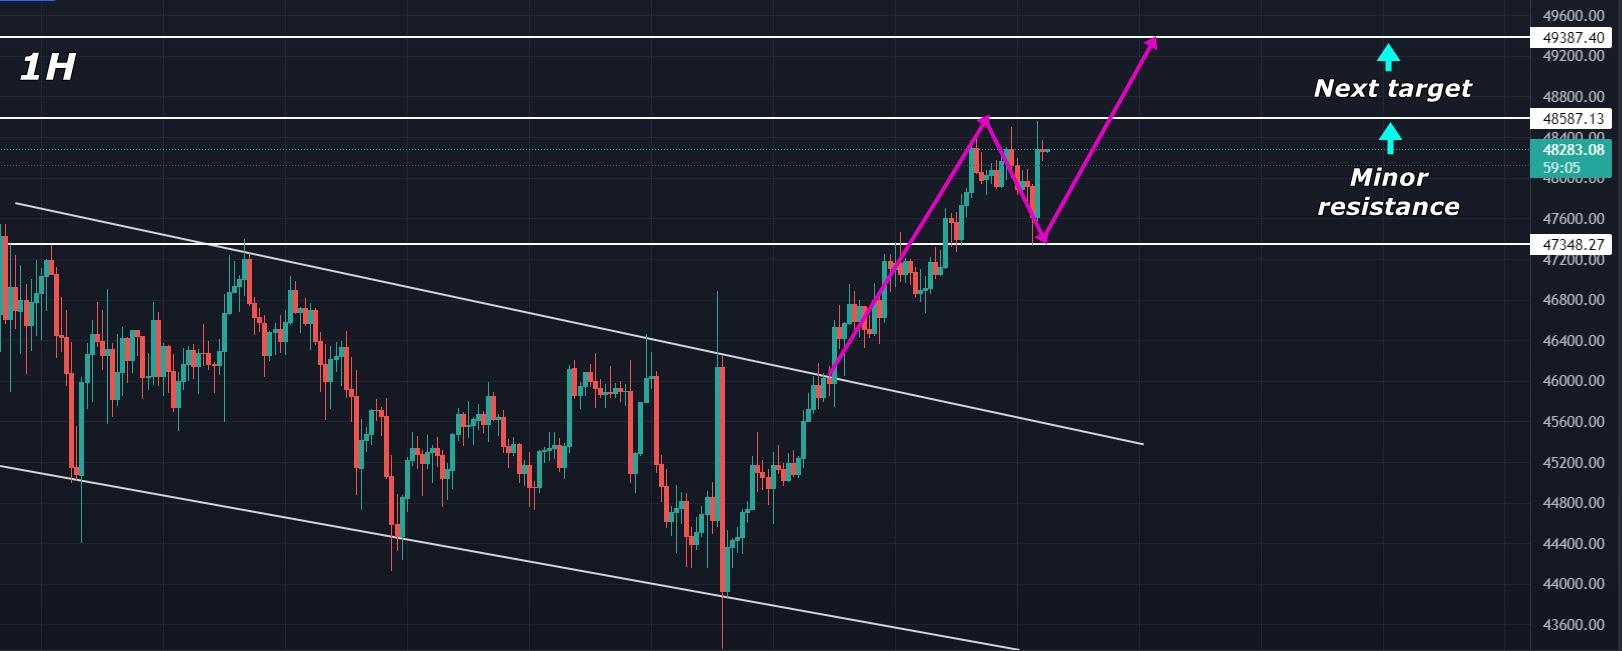 Bitcoin (BTC) Price Analysis – Breakout Target Met, What's ...